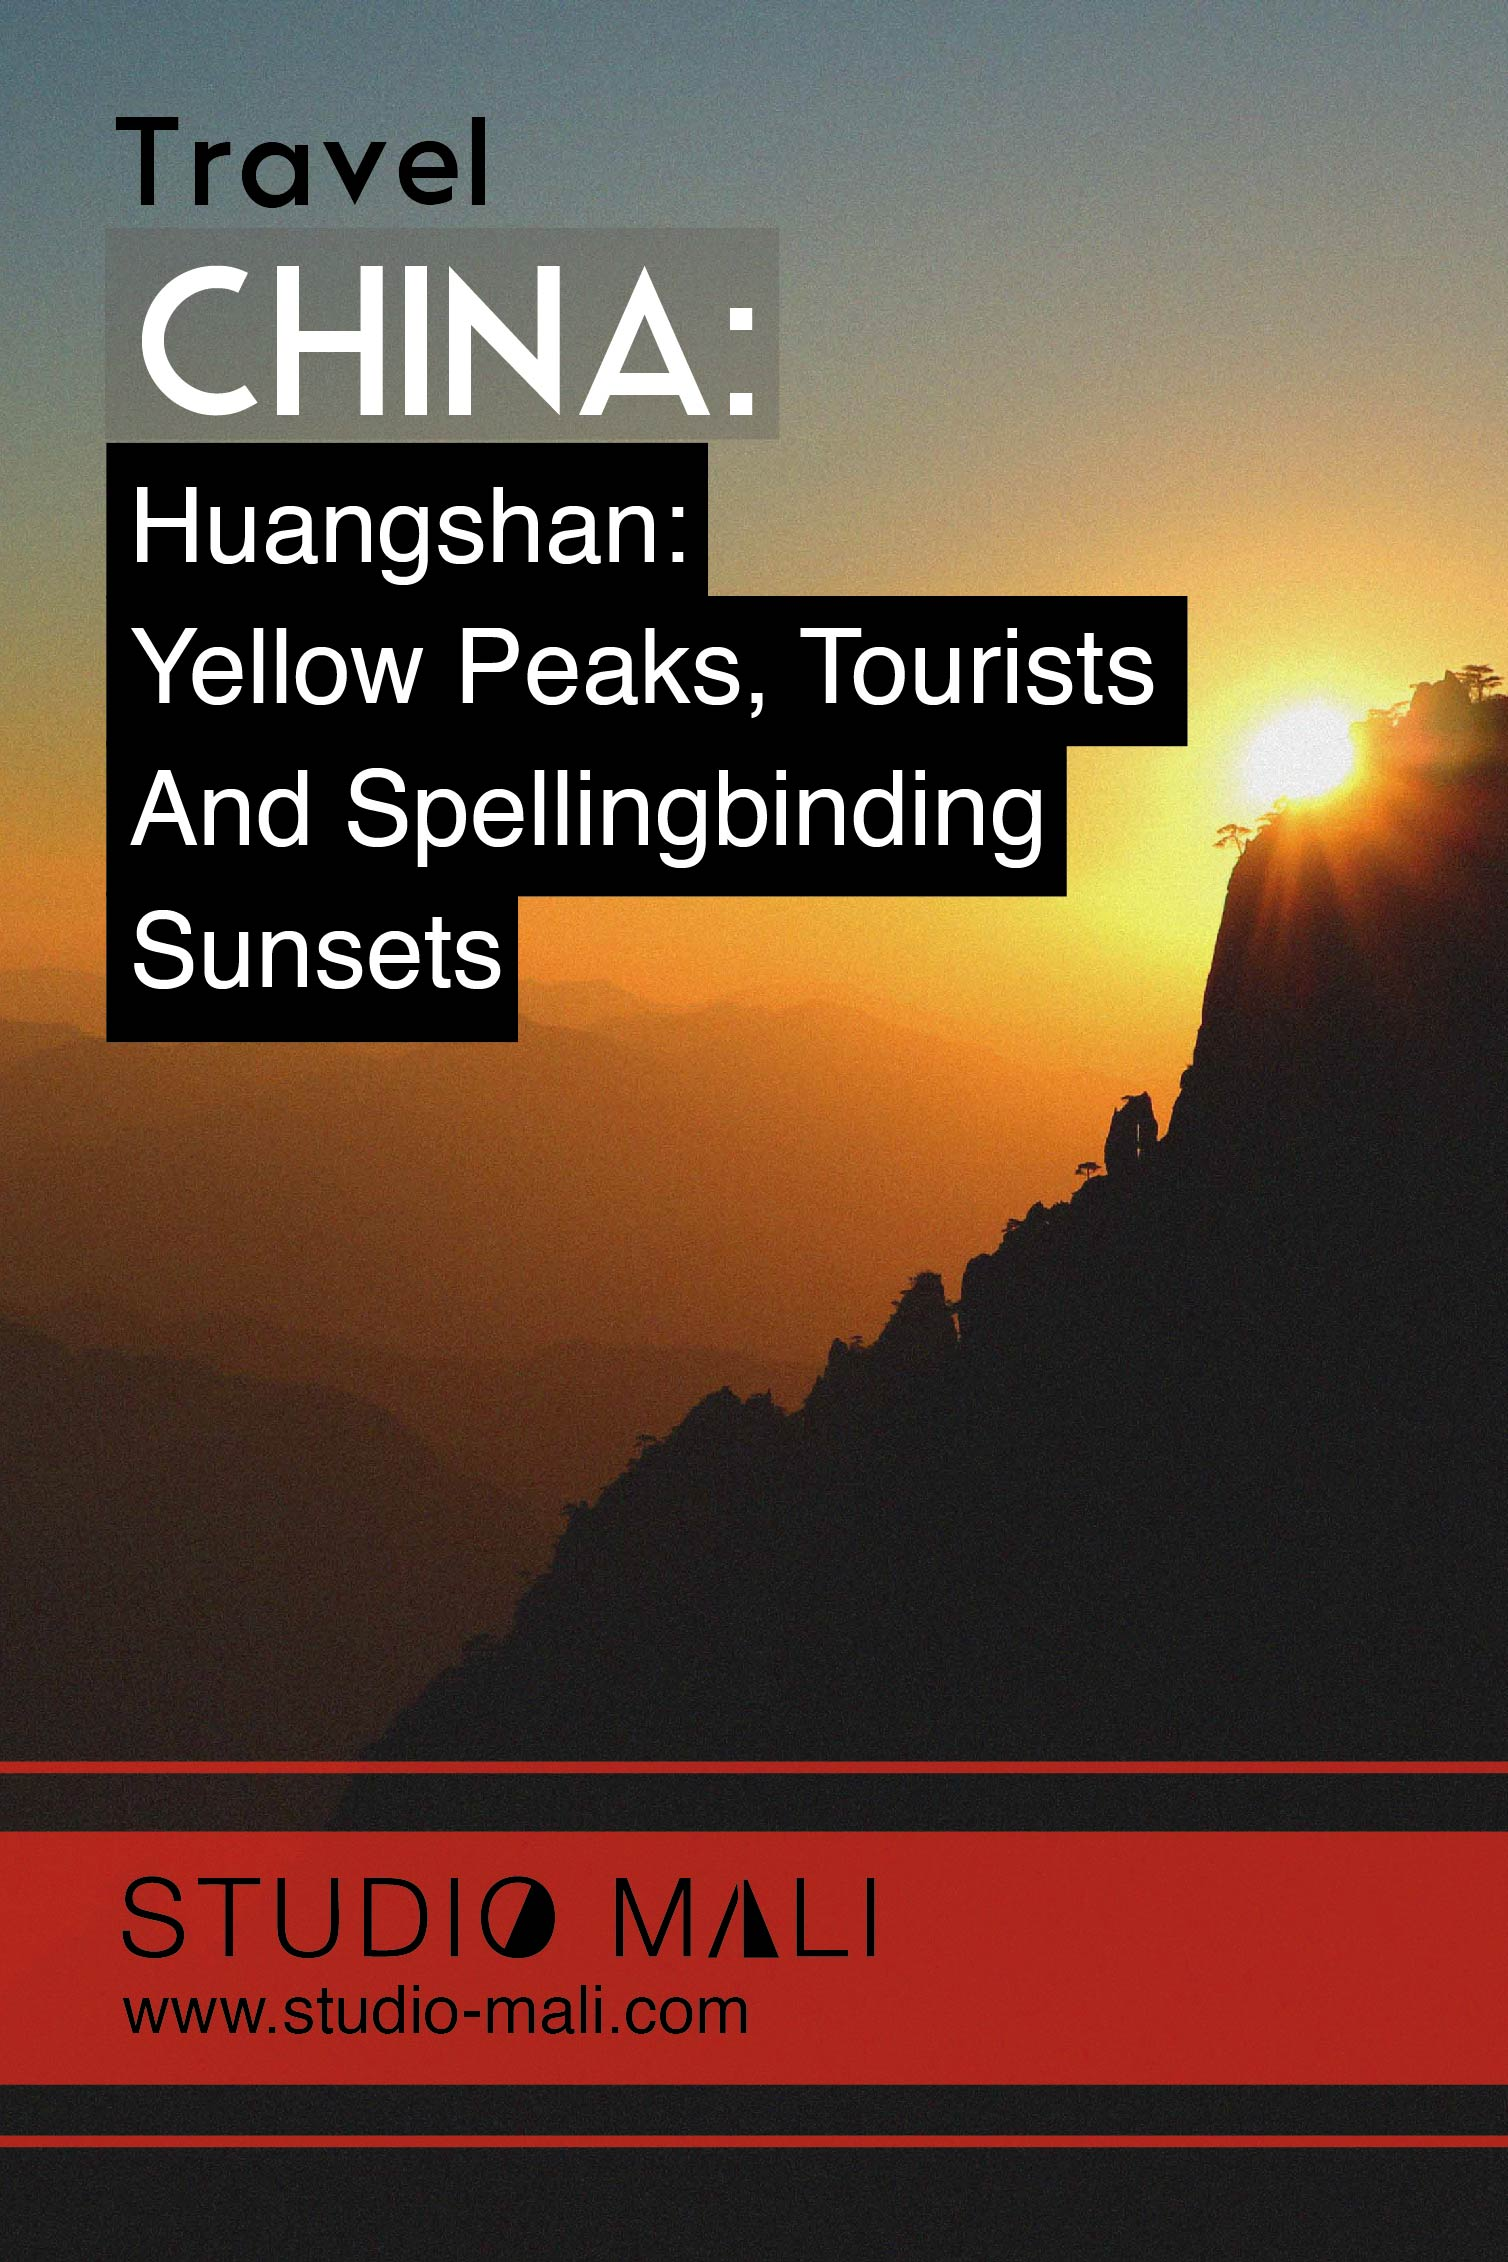 China - Huangshan - Yellow Peaks, Tourists & Spellbinding Sunsets, by Studio Mali